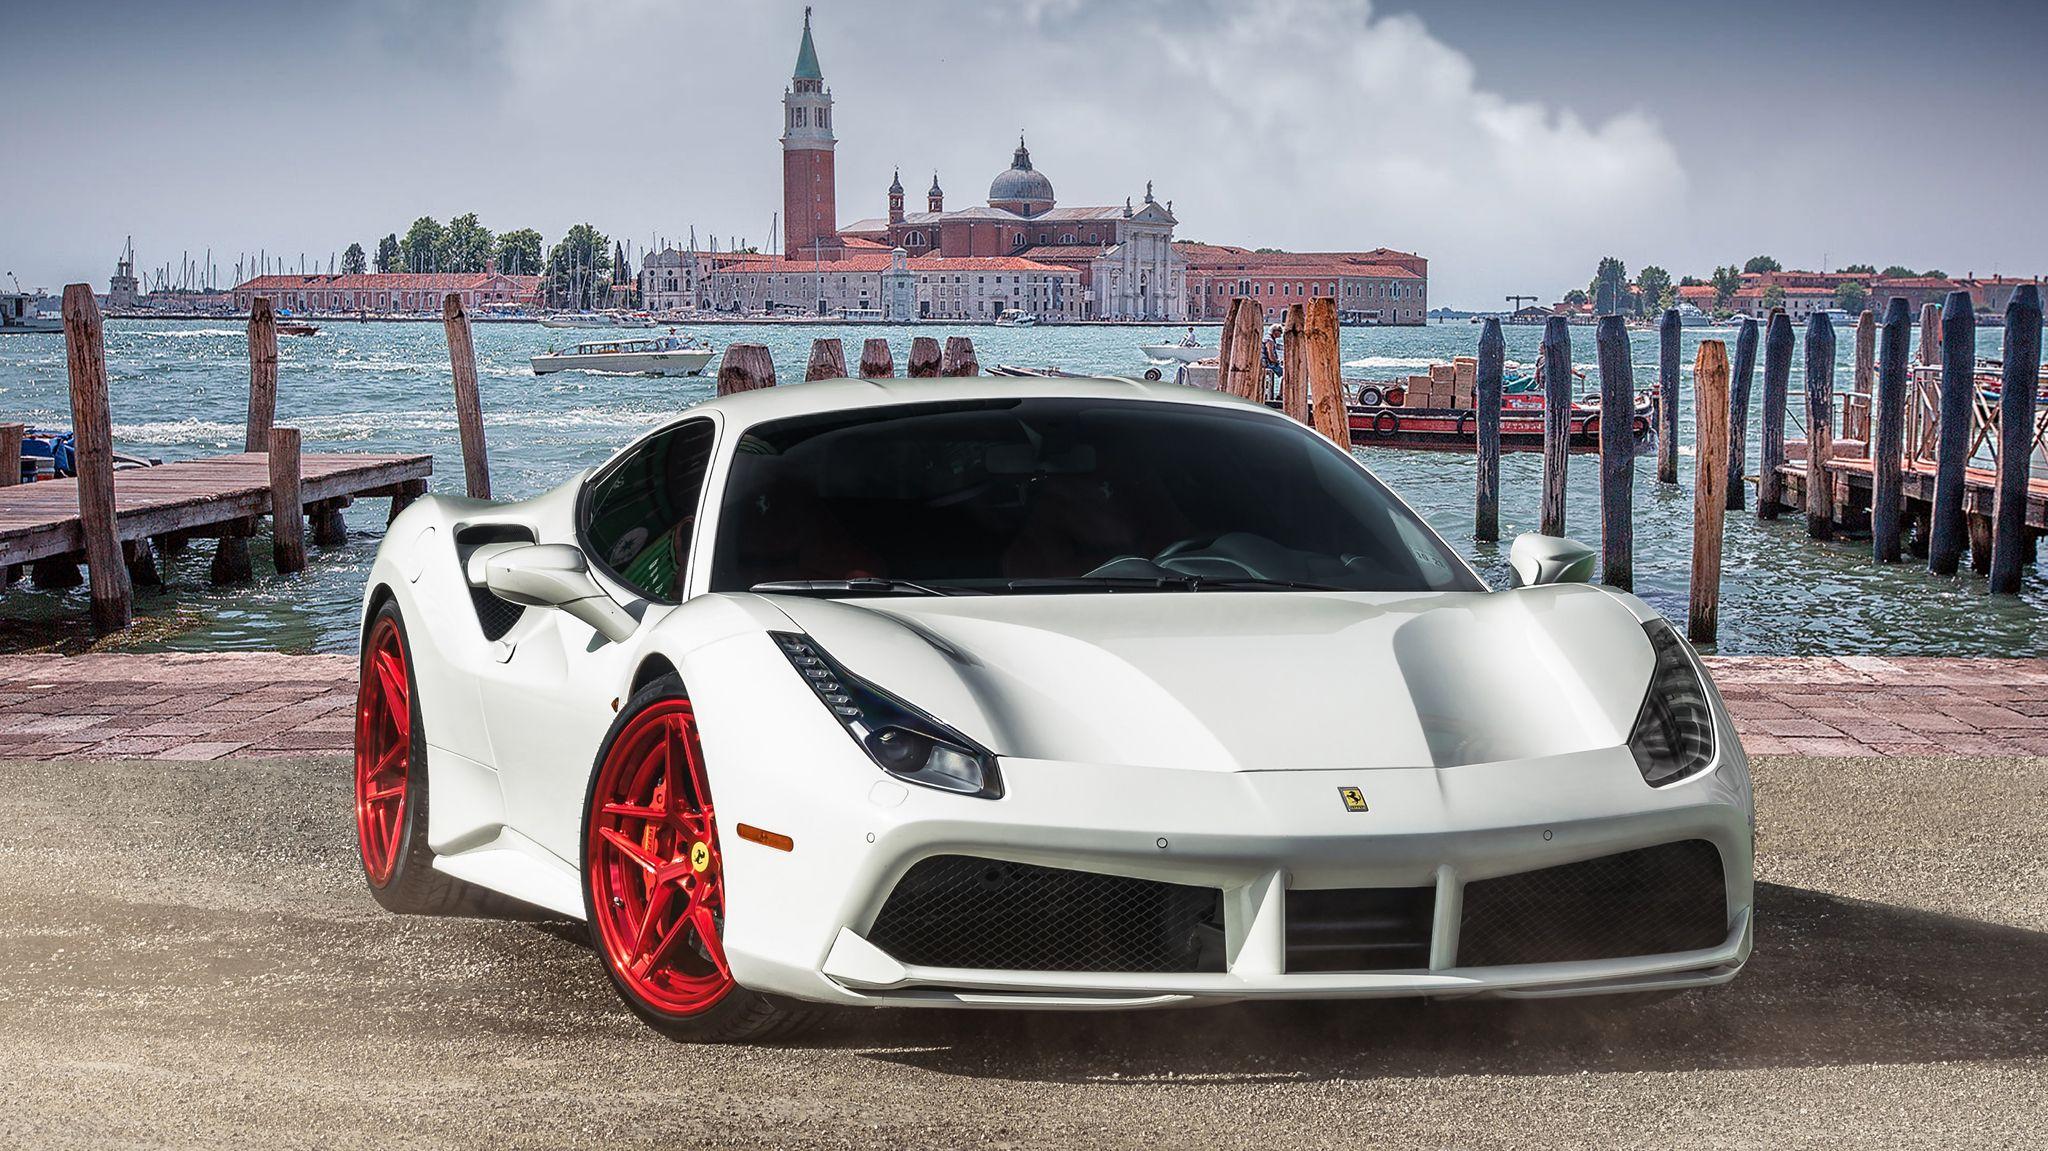 2017 Ferrari 488 Gtb White Ferrari 488 Ferrari 488 Gtb